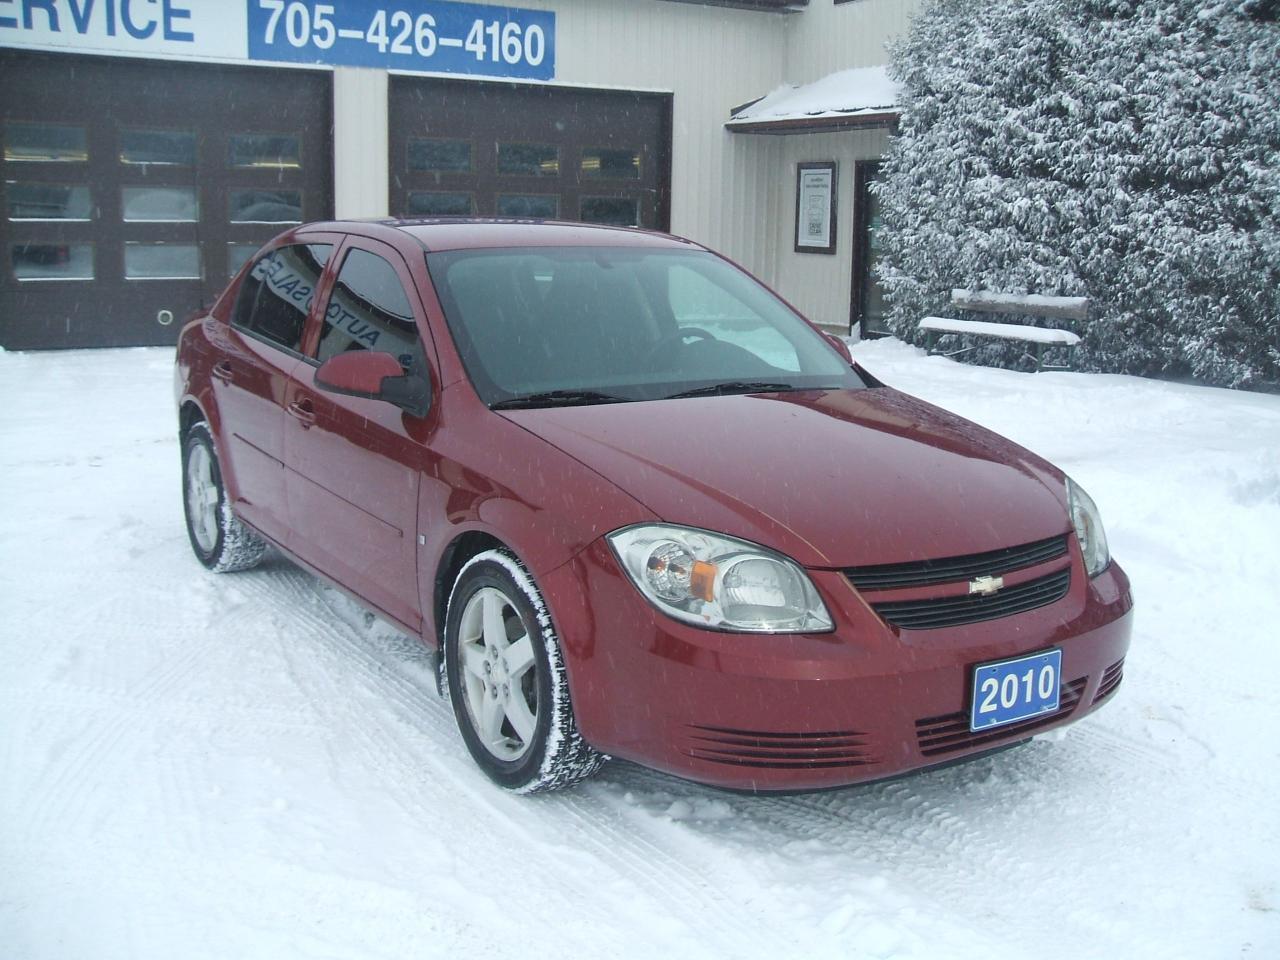 Photo of Maroon 2010 Chevrolet Cobalt